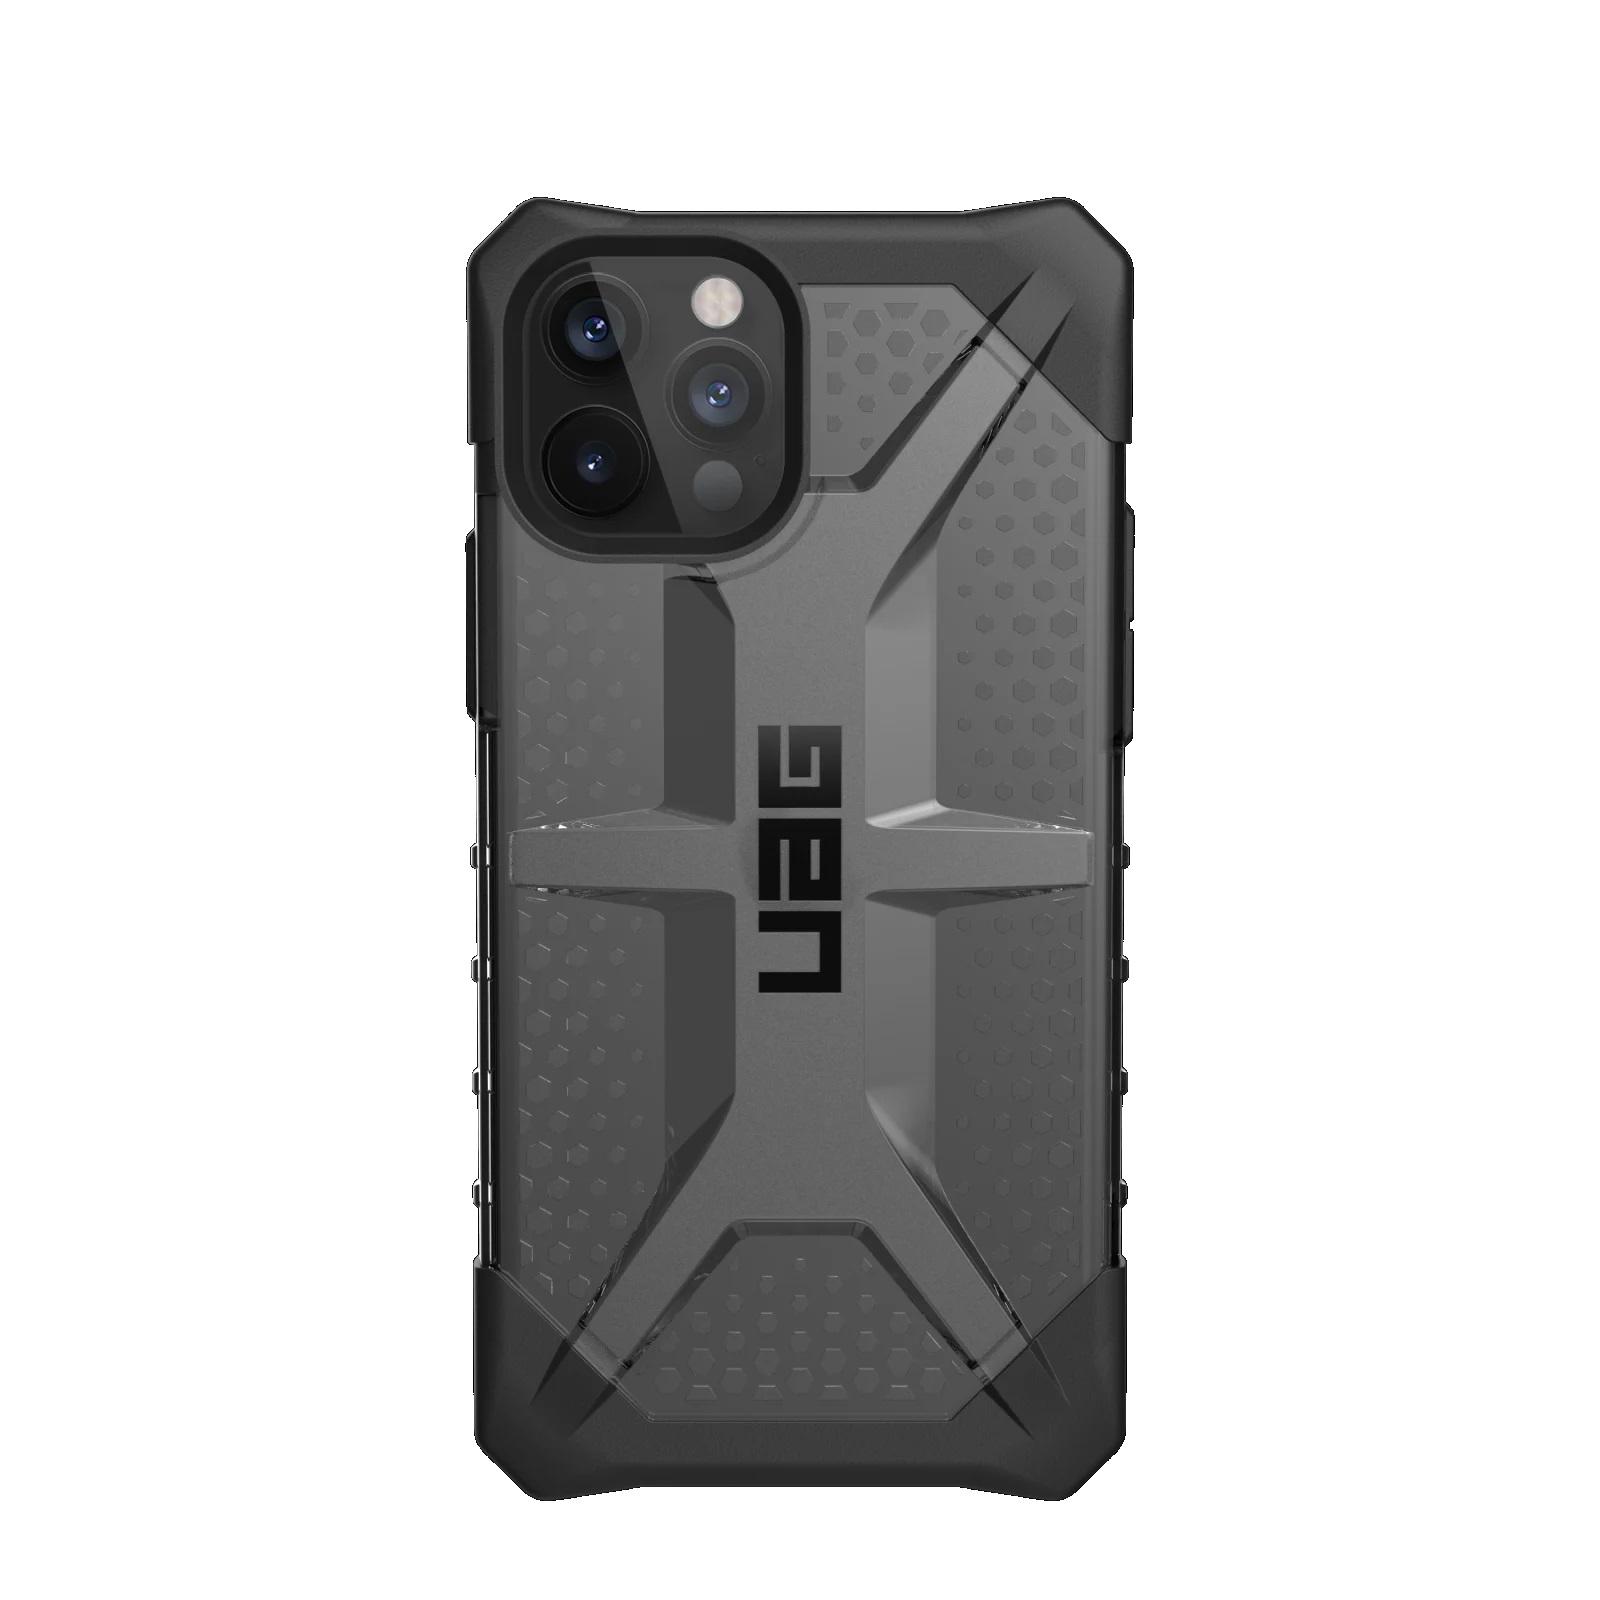 "Urban Armor Gear Plasma funda para teléfono móvil 17 cm (6.7"") Negro, Gris, Transparente"